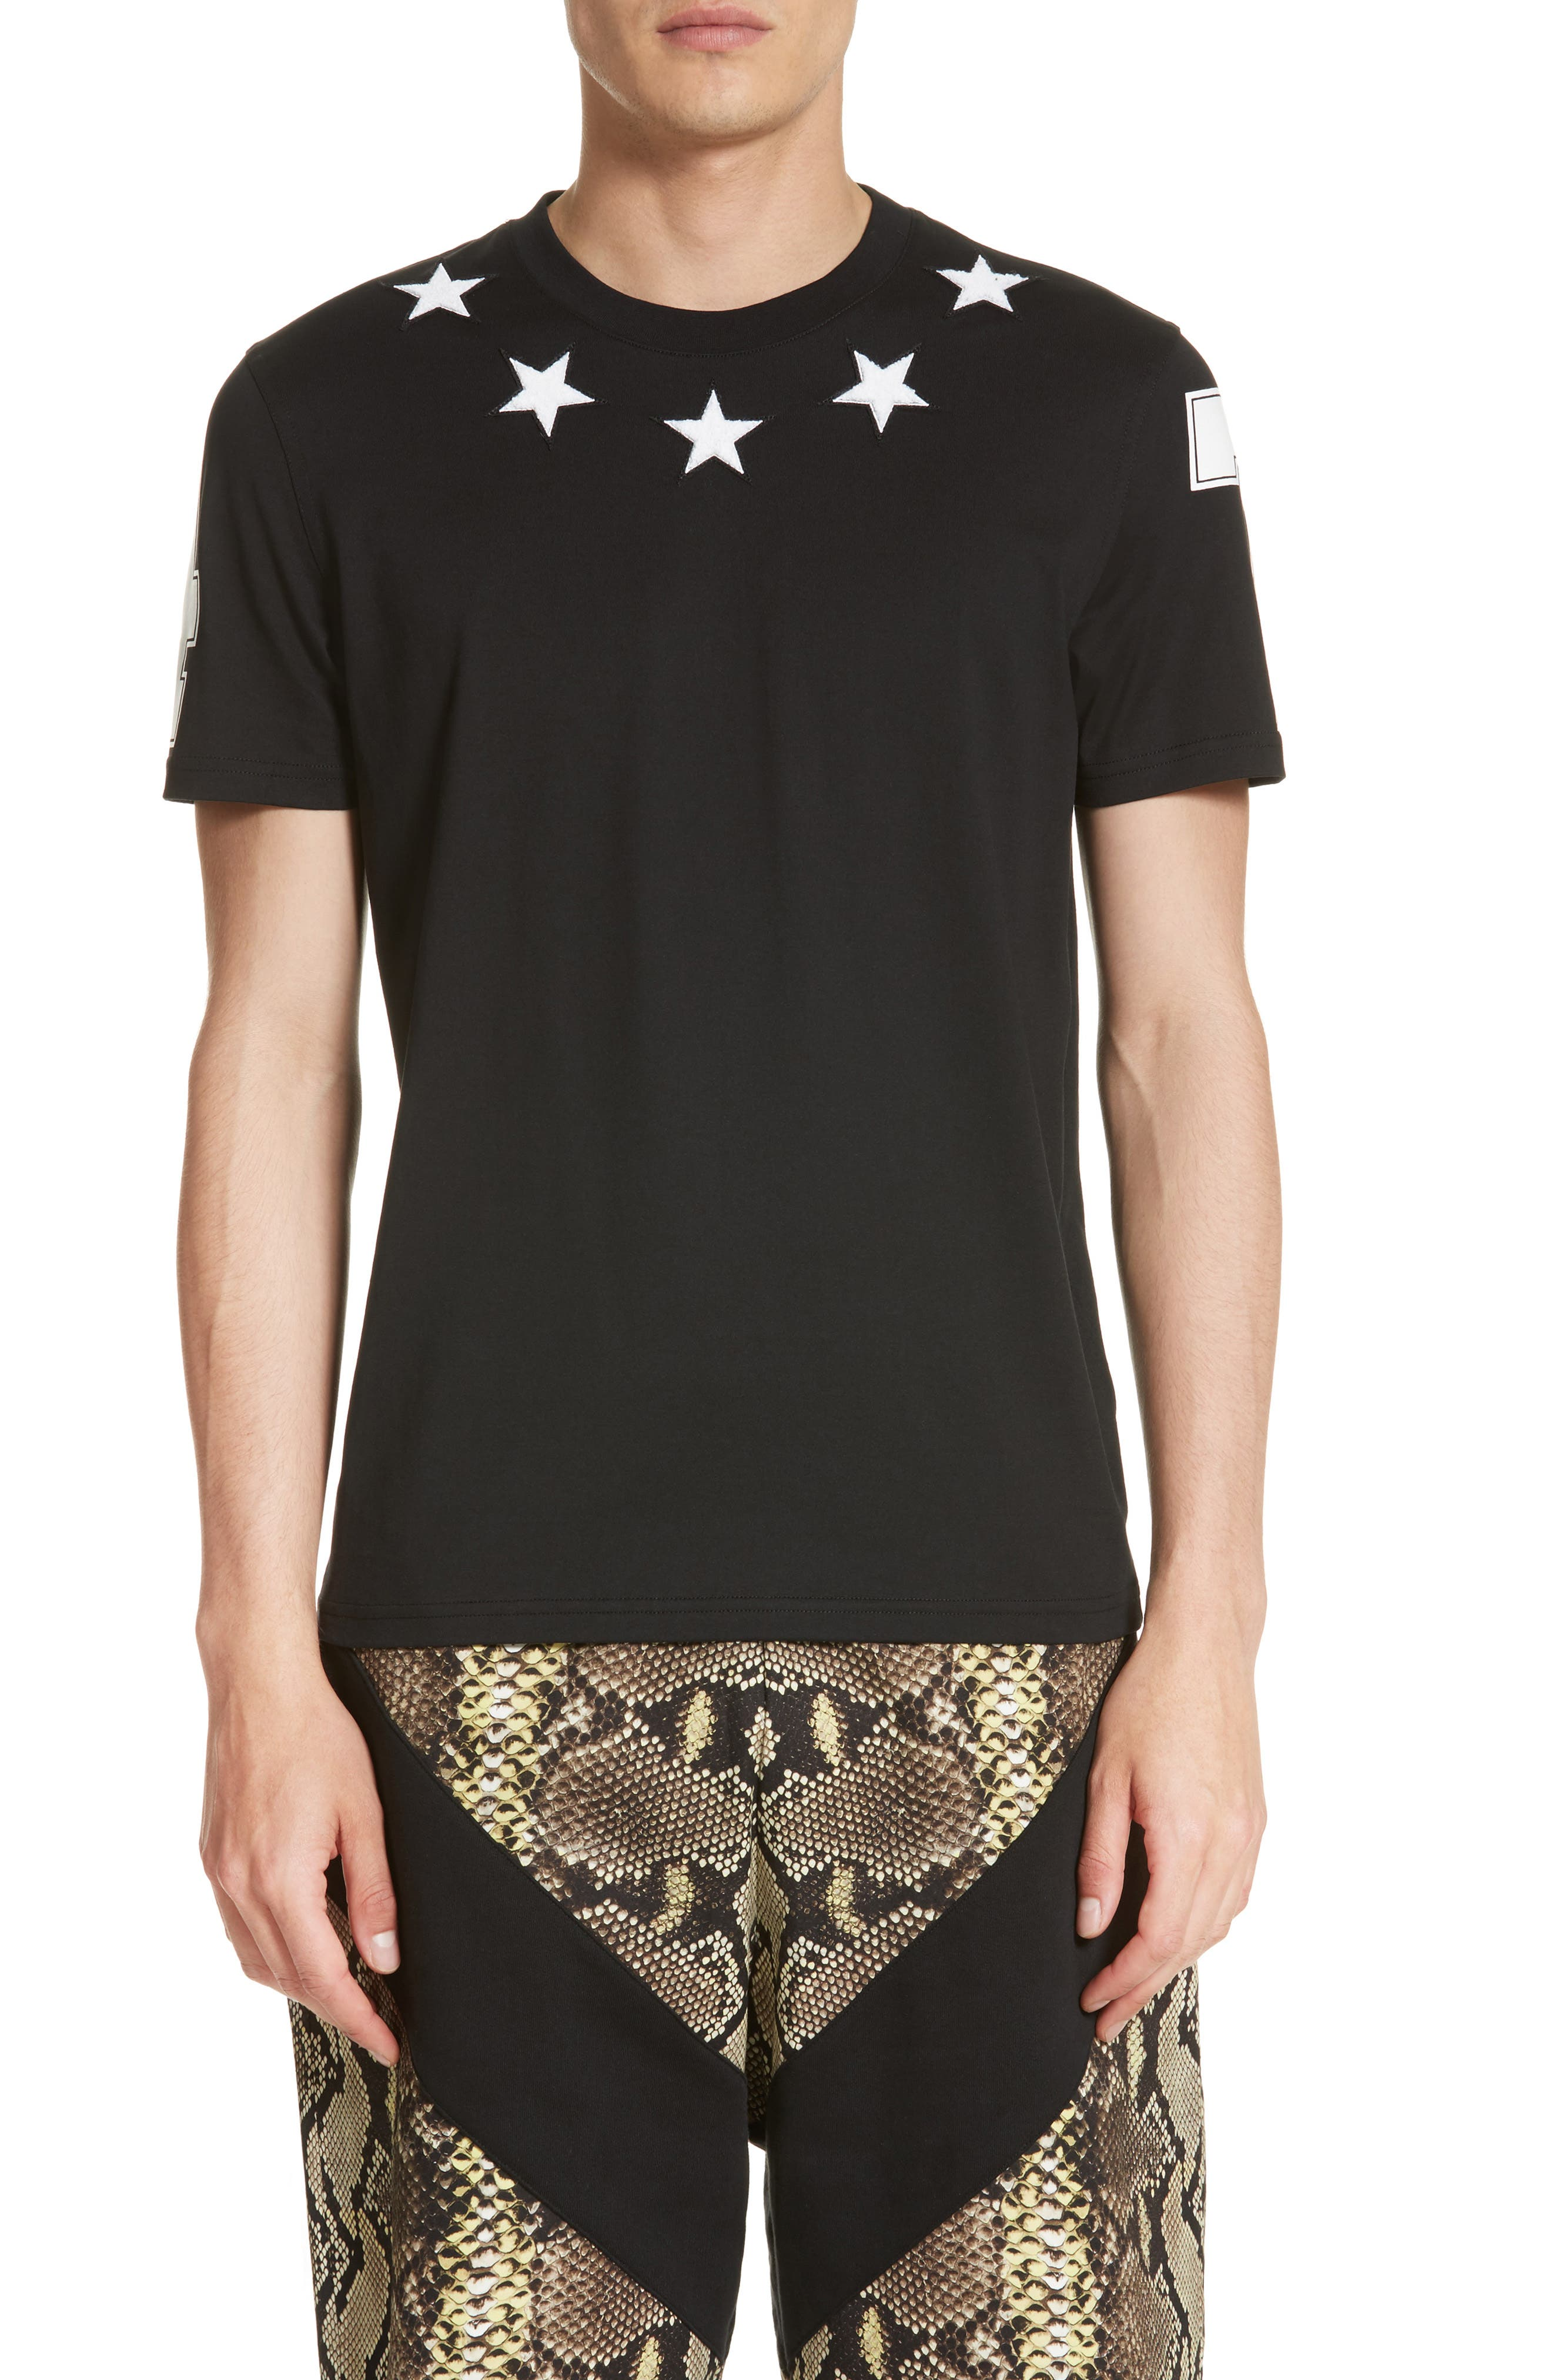 Givenchy Cuban Fit Star 74 T-Shirt